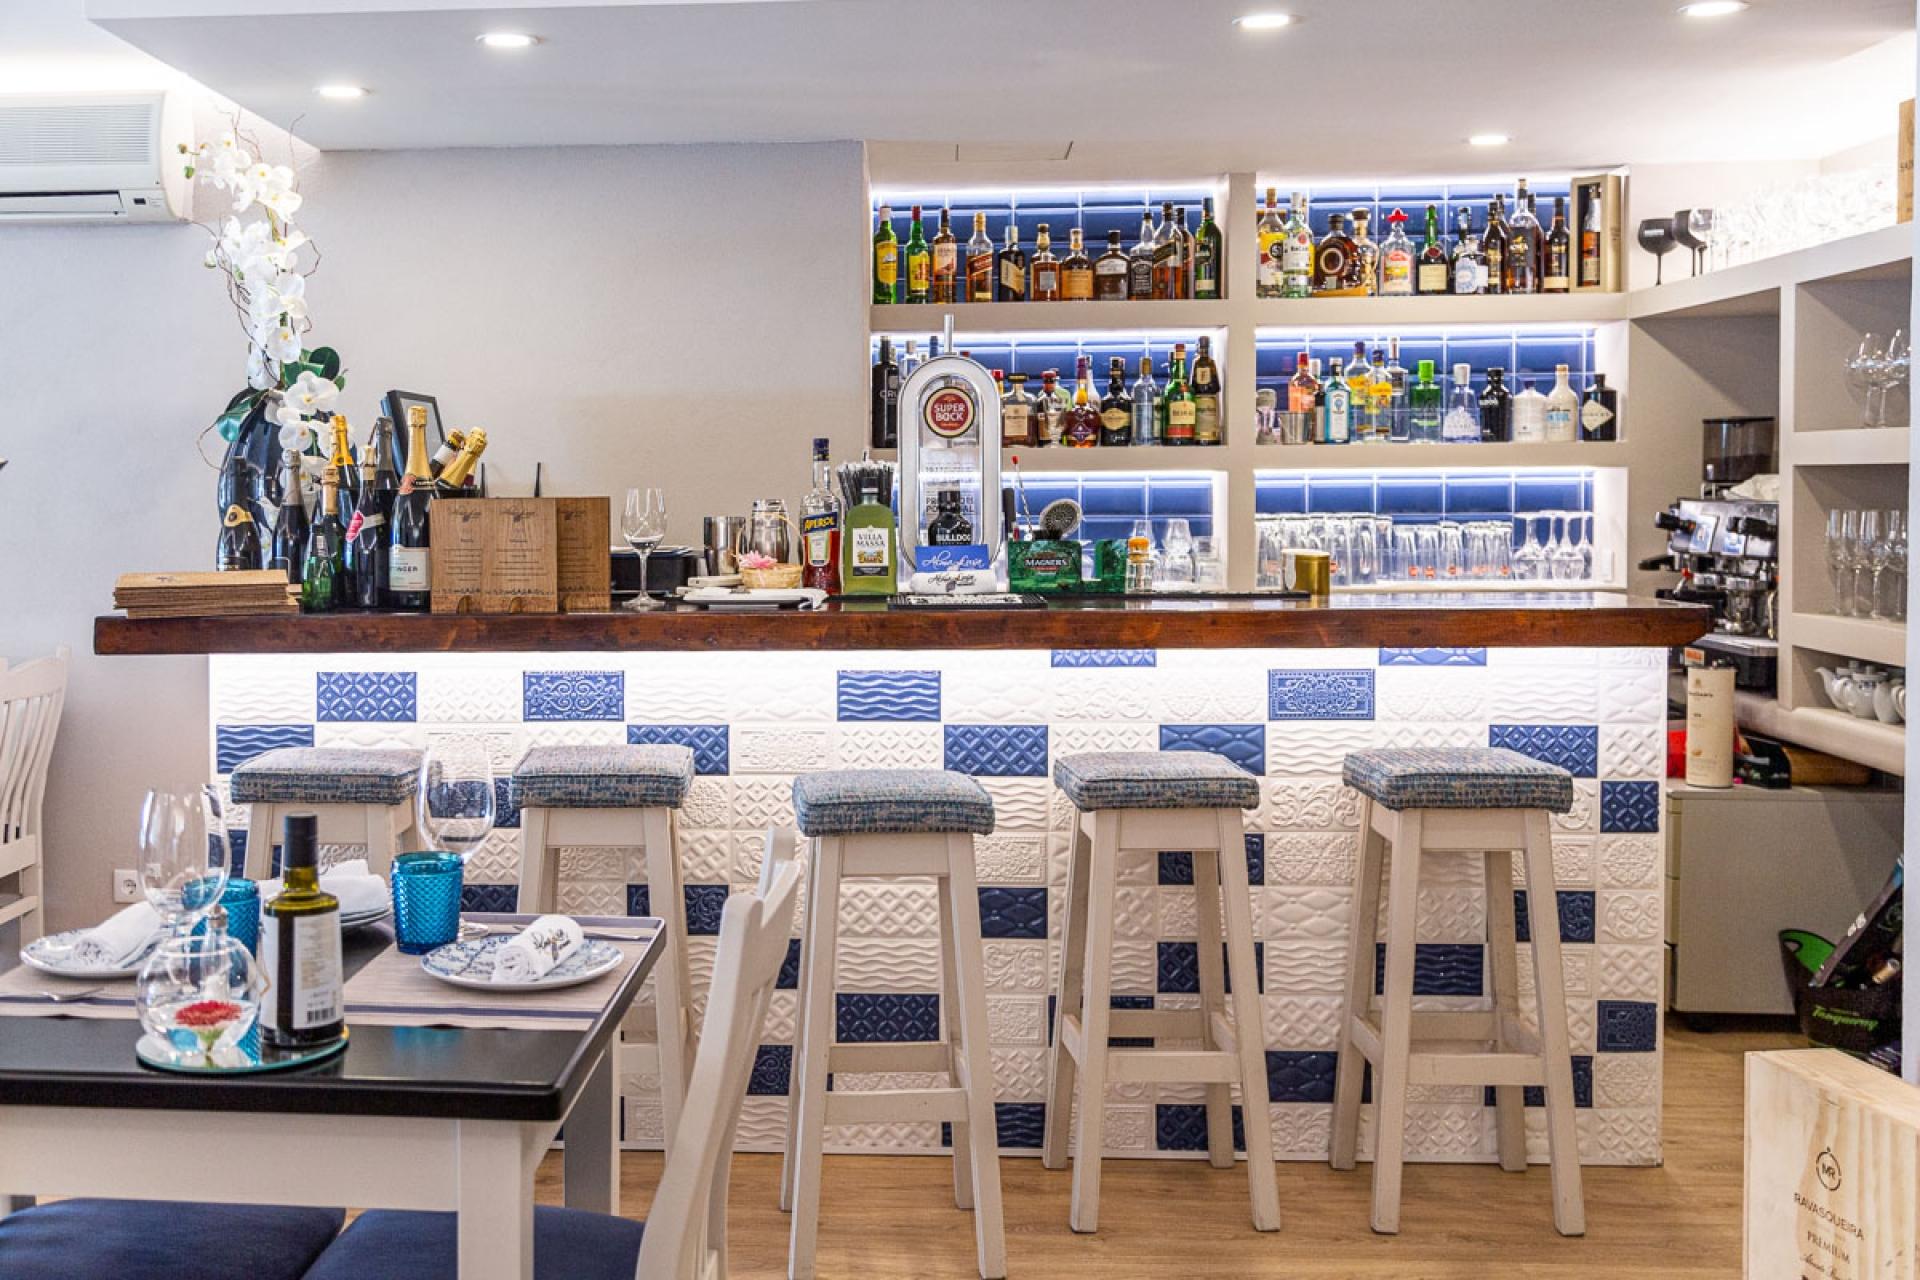 AlgarveCool_Comer_Restaurante_Alma_Lusa